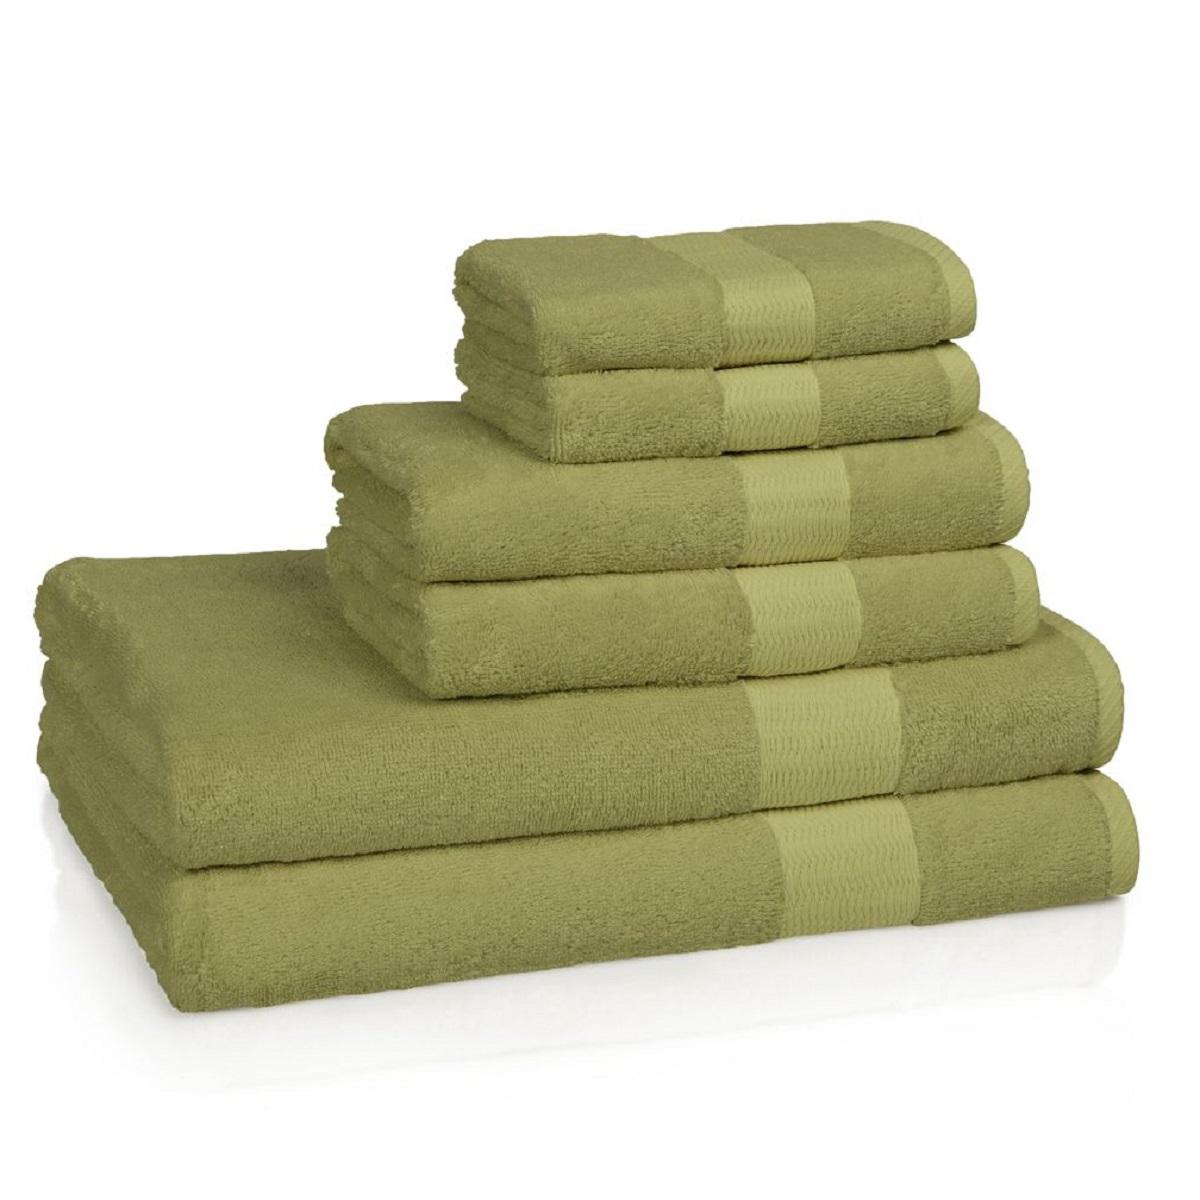 Элитный банный коврик Bamboo Aloe от Kassatex